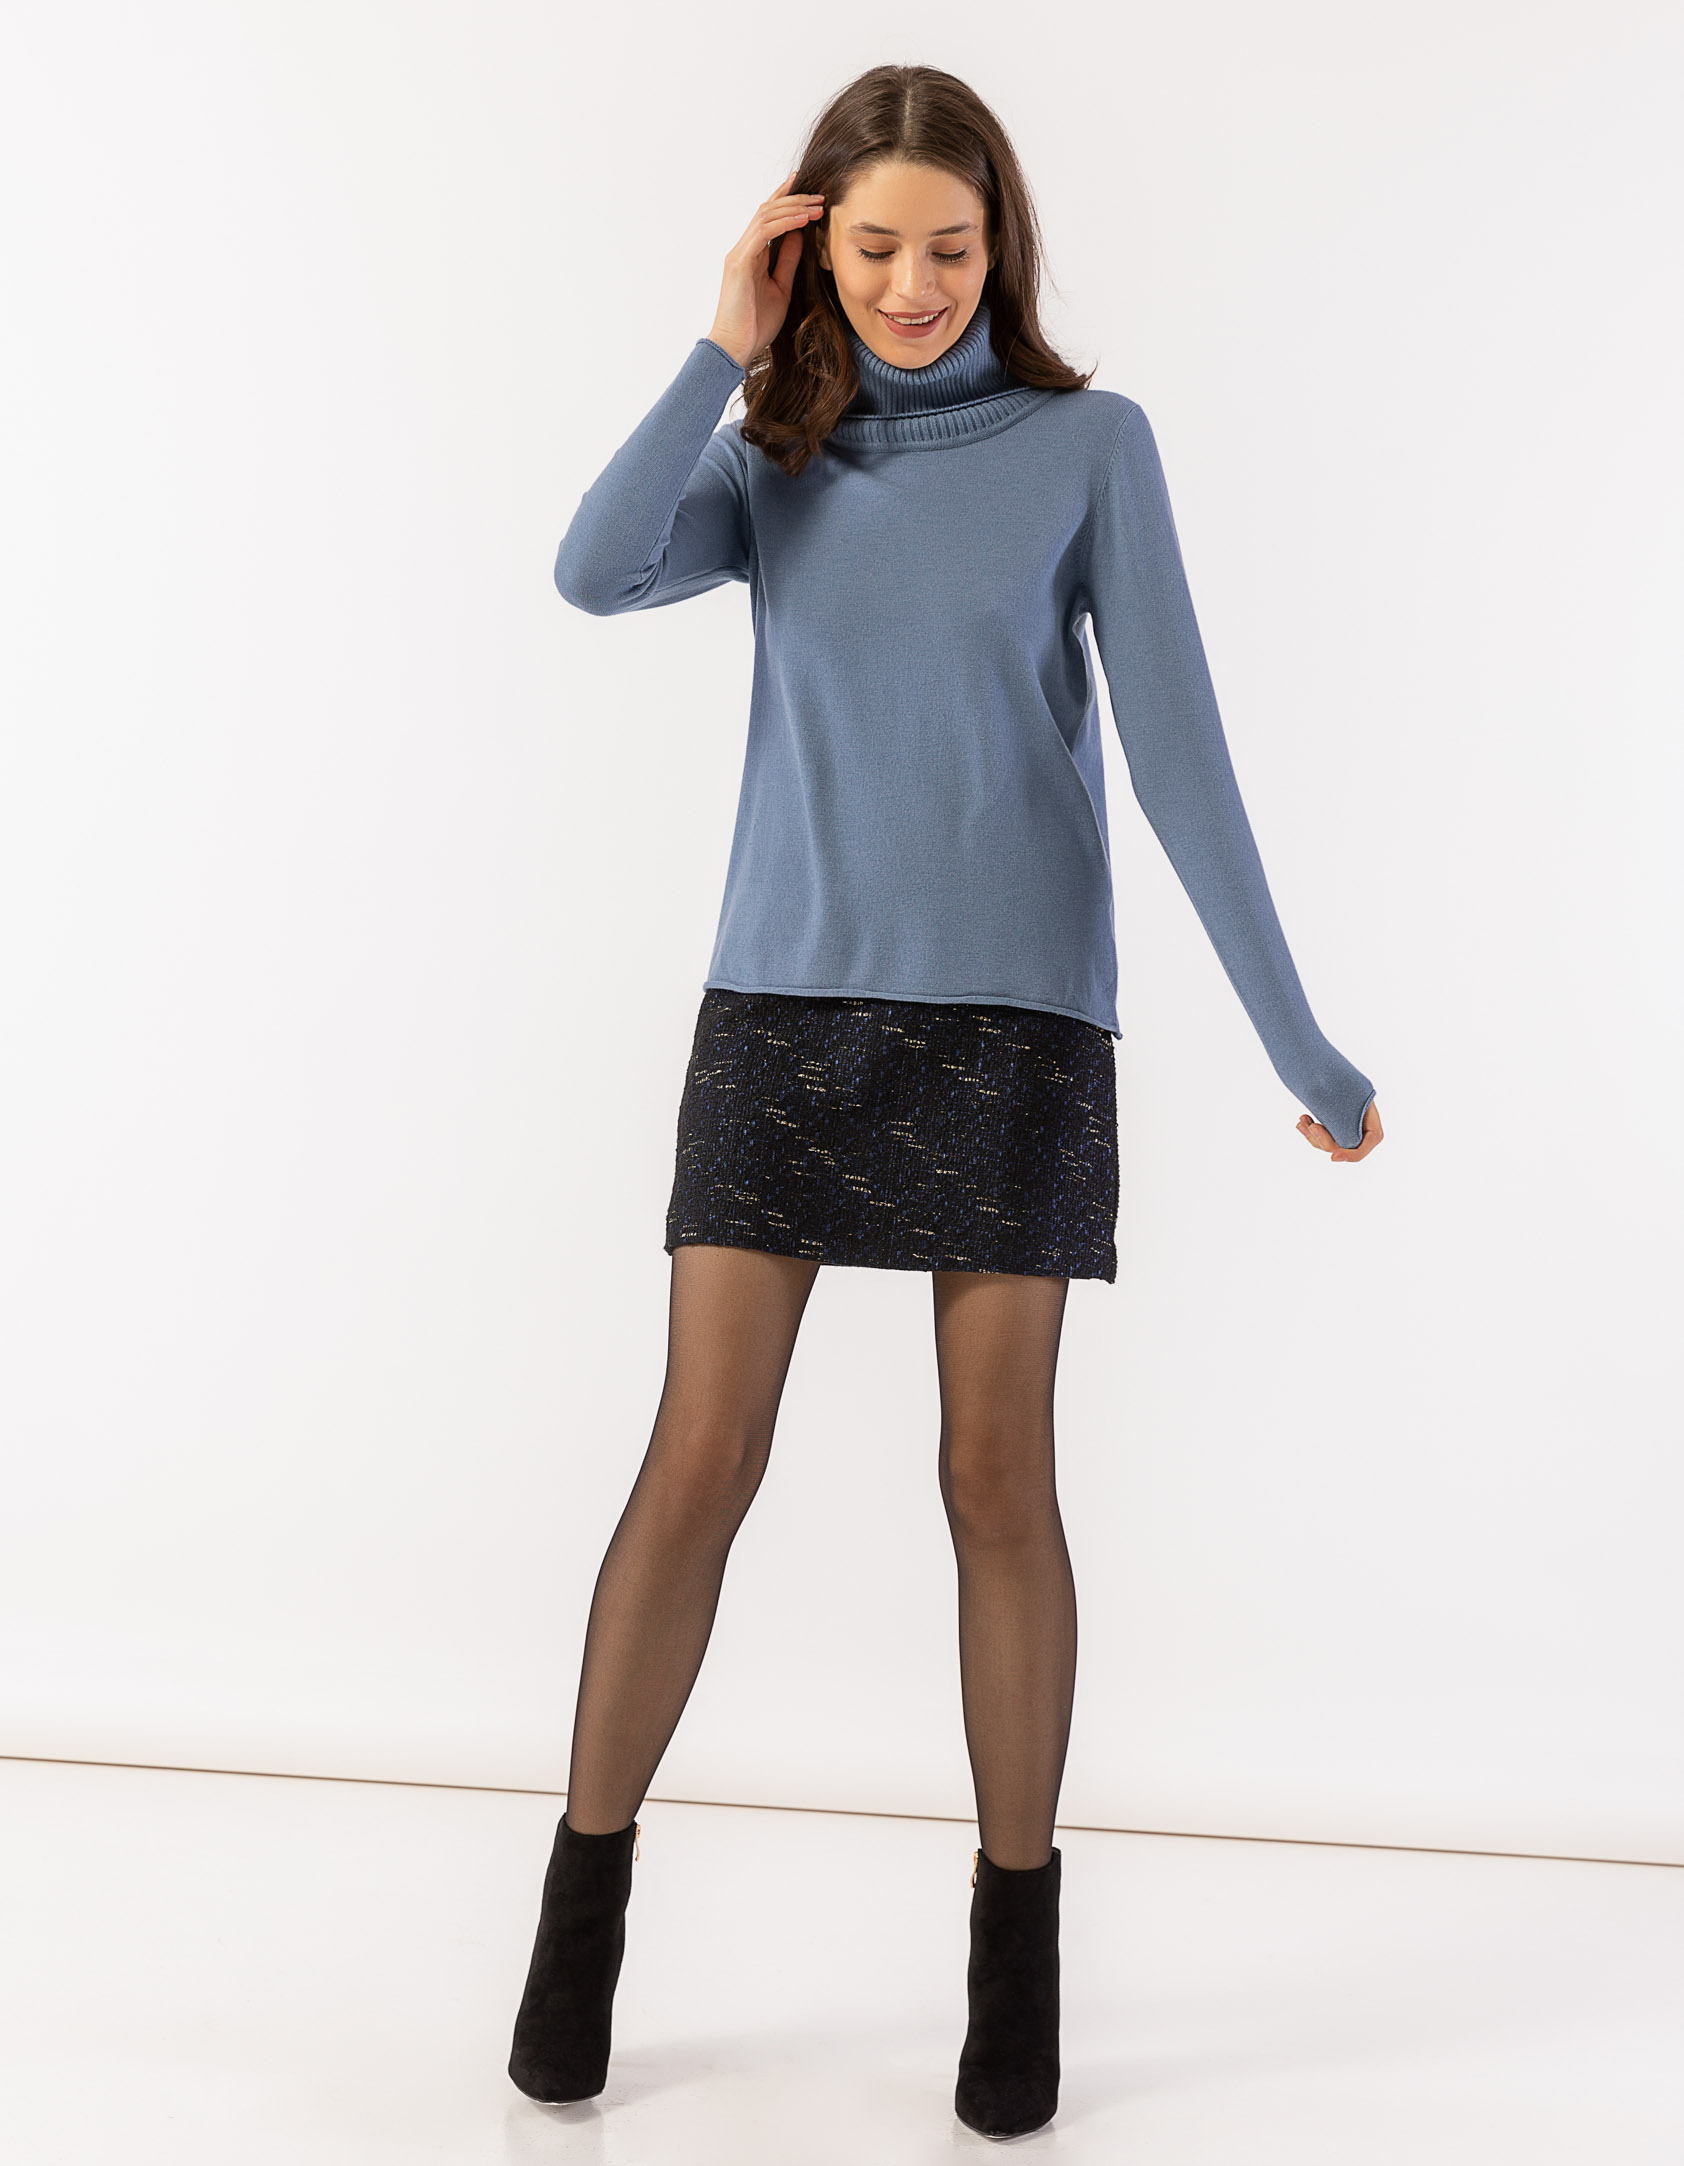 5c1aacd3464 Φούστα mini σε Α γραμμή από μπουκλέ ύφασμα - Issue Fashion